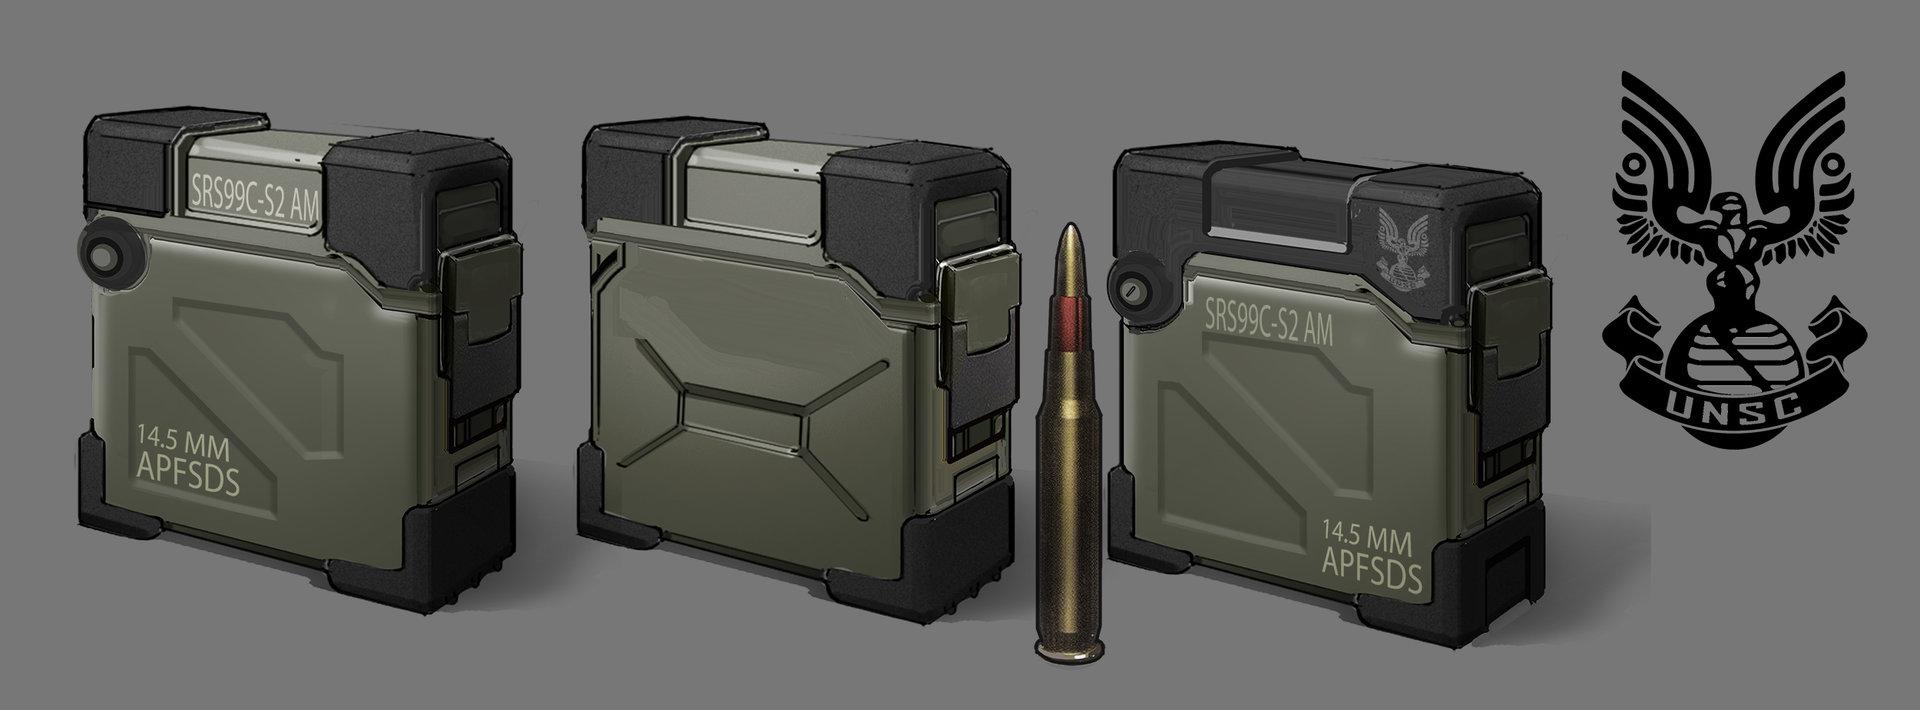 Jason borne sniper ammo pickup